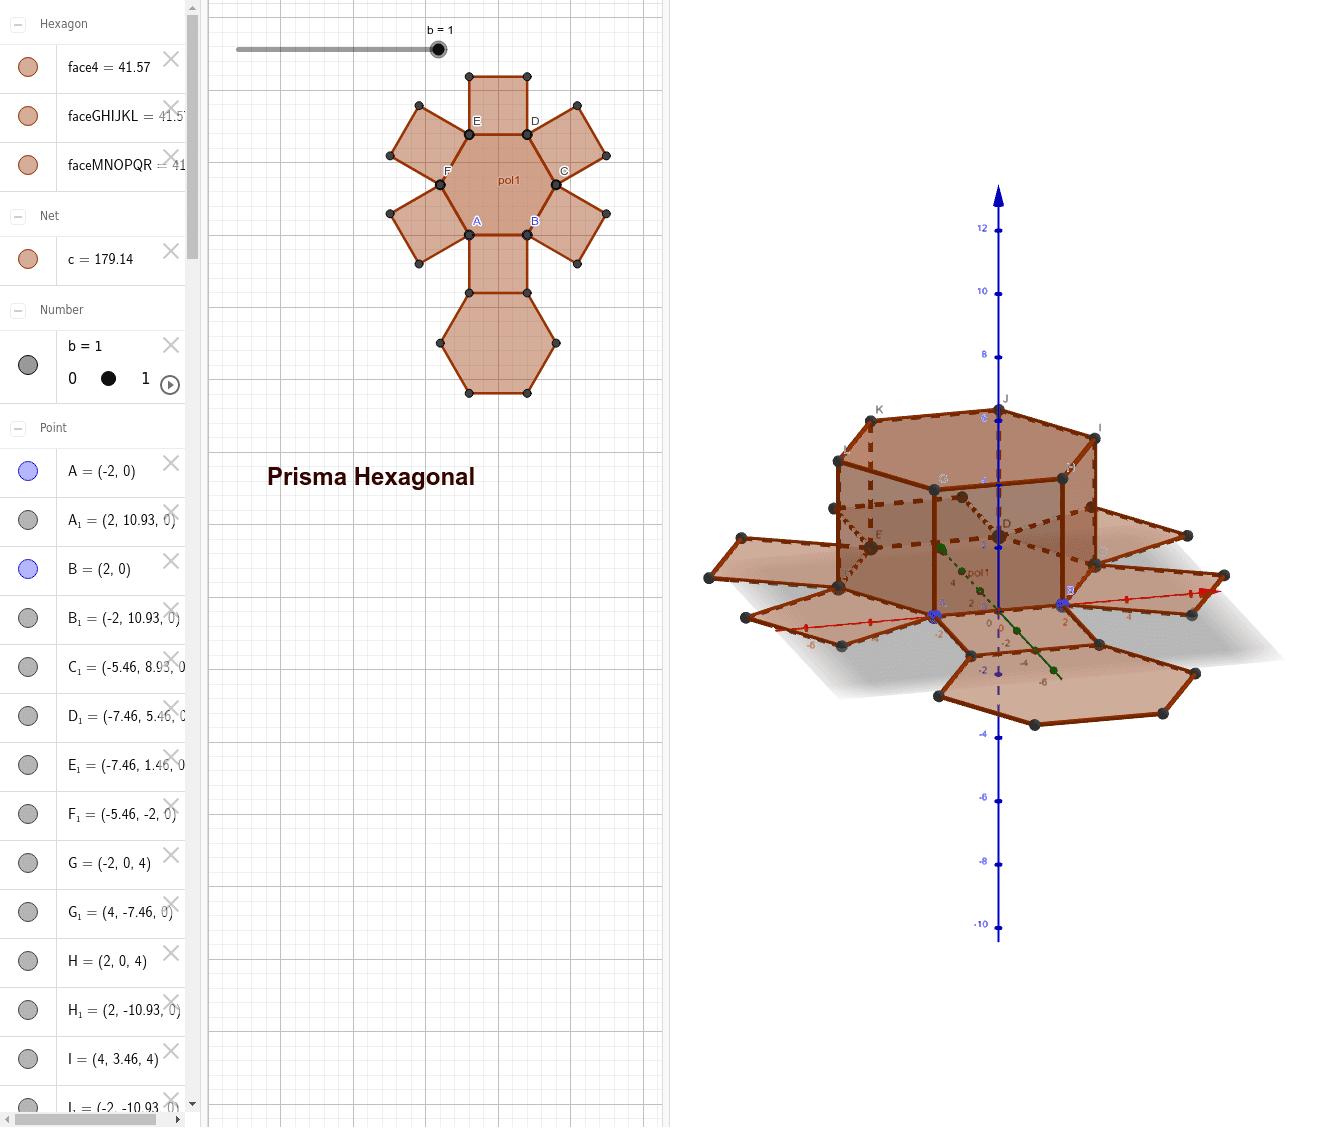 Prisma Hexagonal Press Enter to start activity